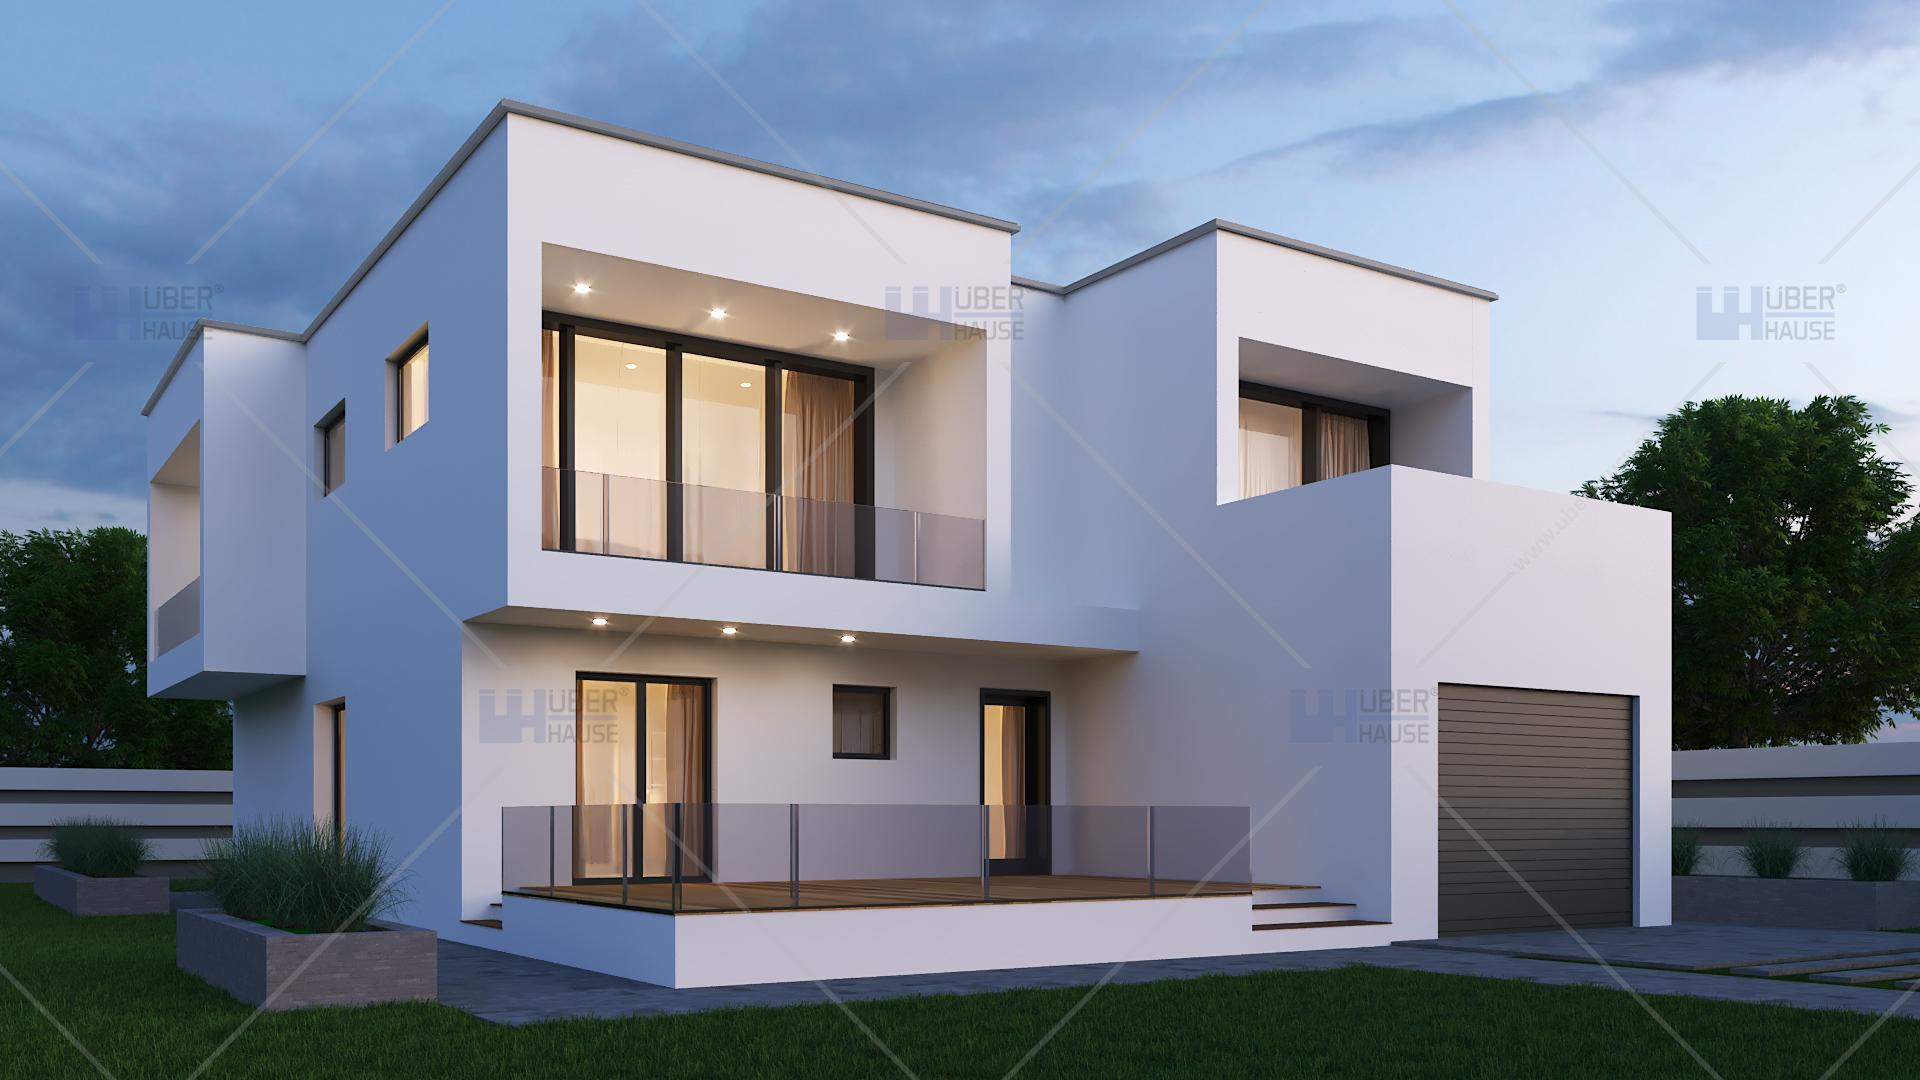 Proiect casa parter etaj 187 mp herra for Miglior design di casa moderna